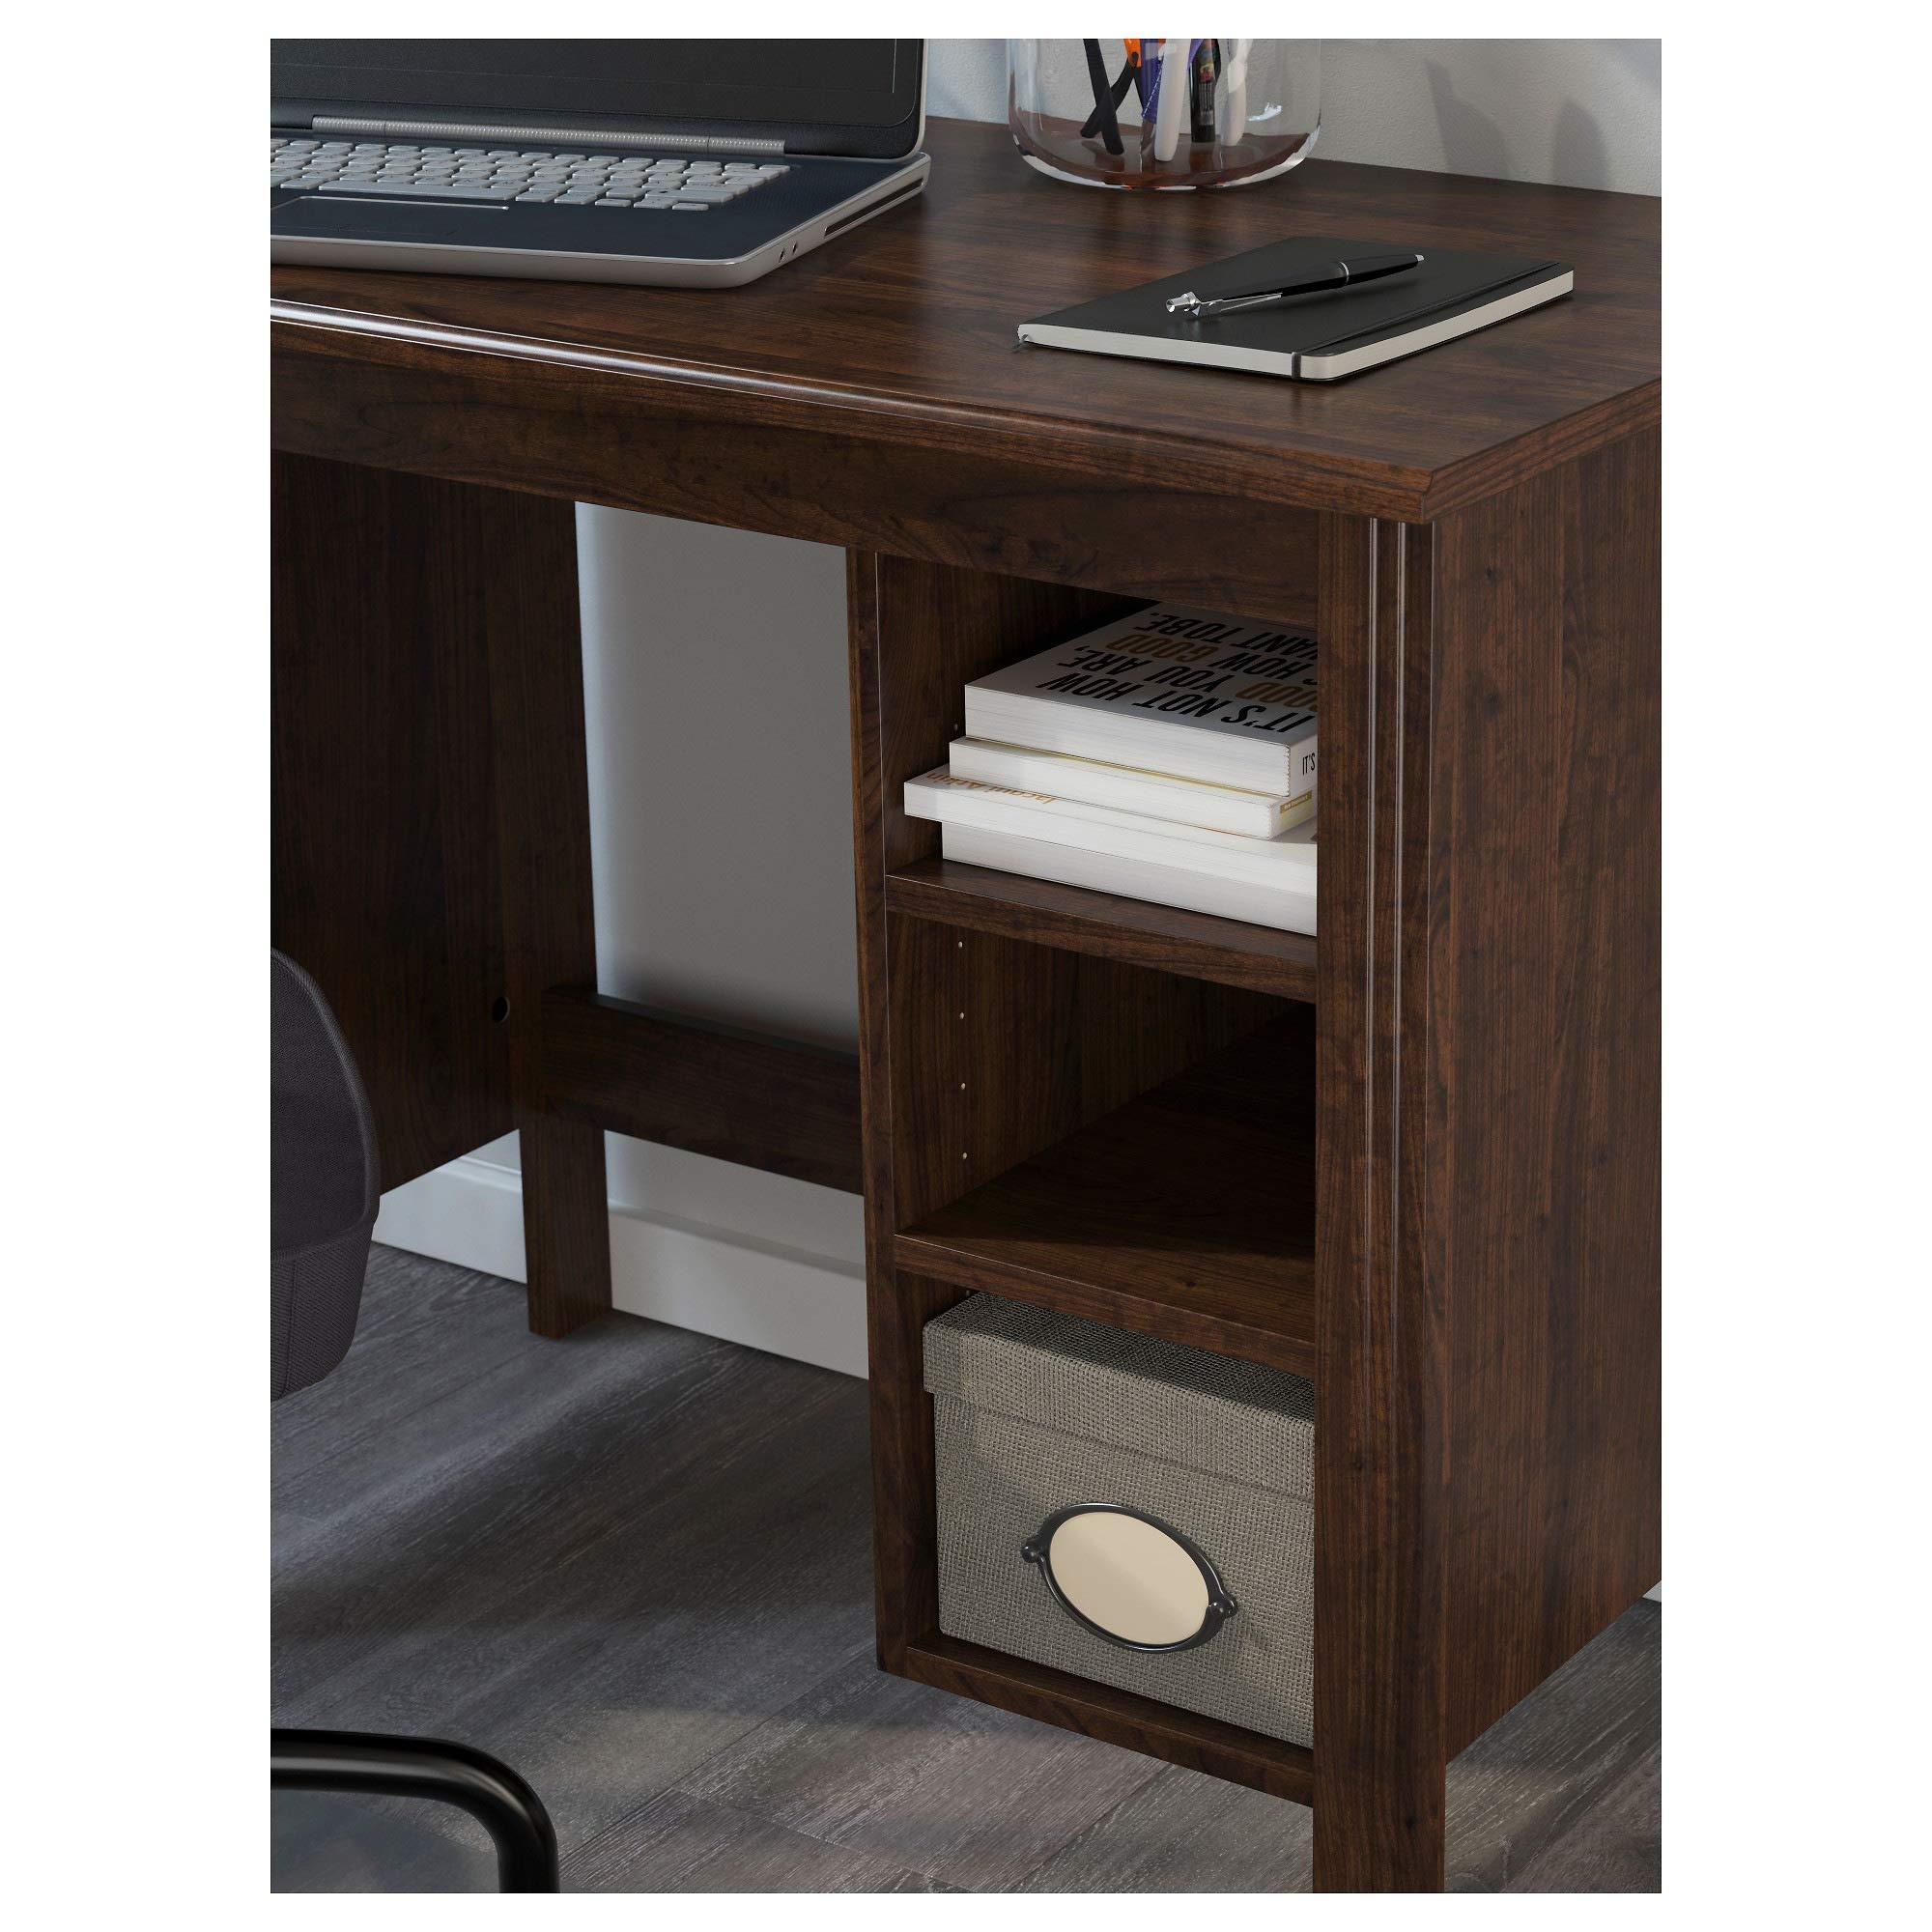 Ikea Brusali Desk Brown Buy Online In Cambodia At Desertcart